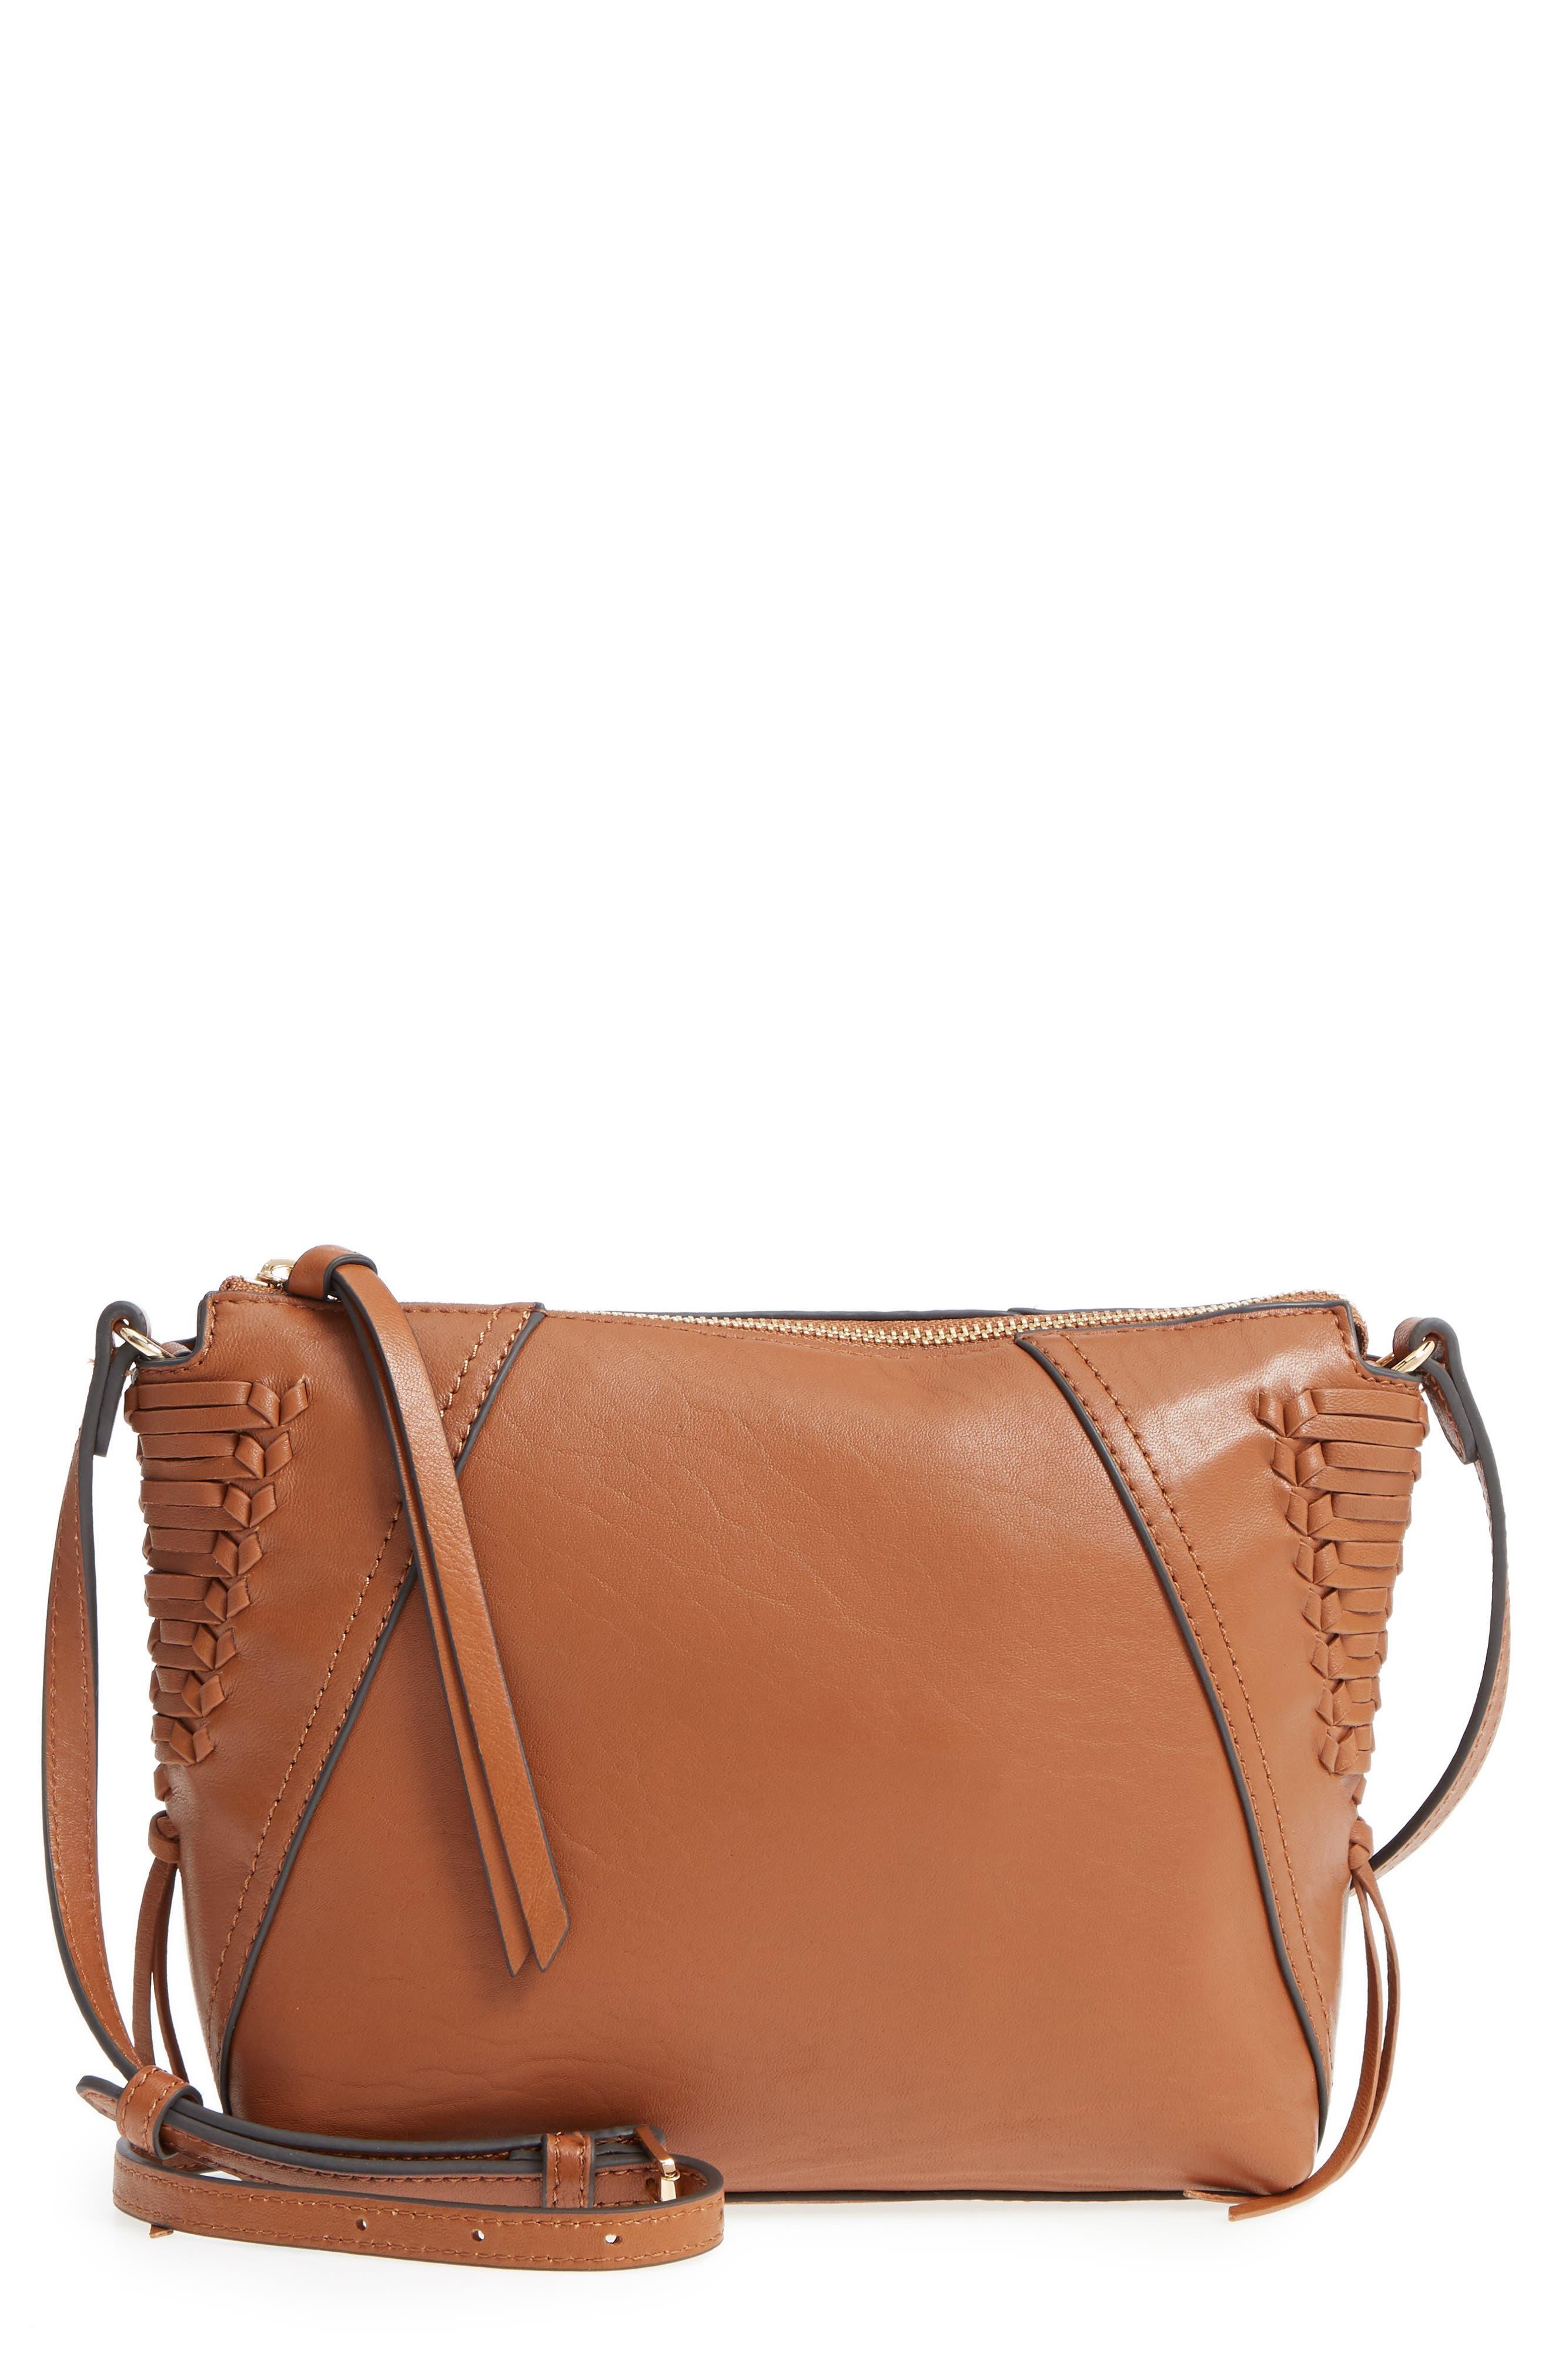 Vince Camuto Ilda Leather Crossbody Bag